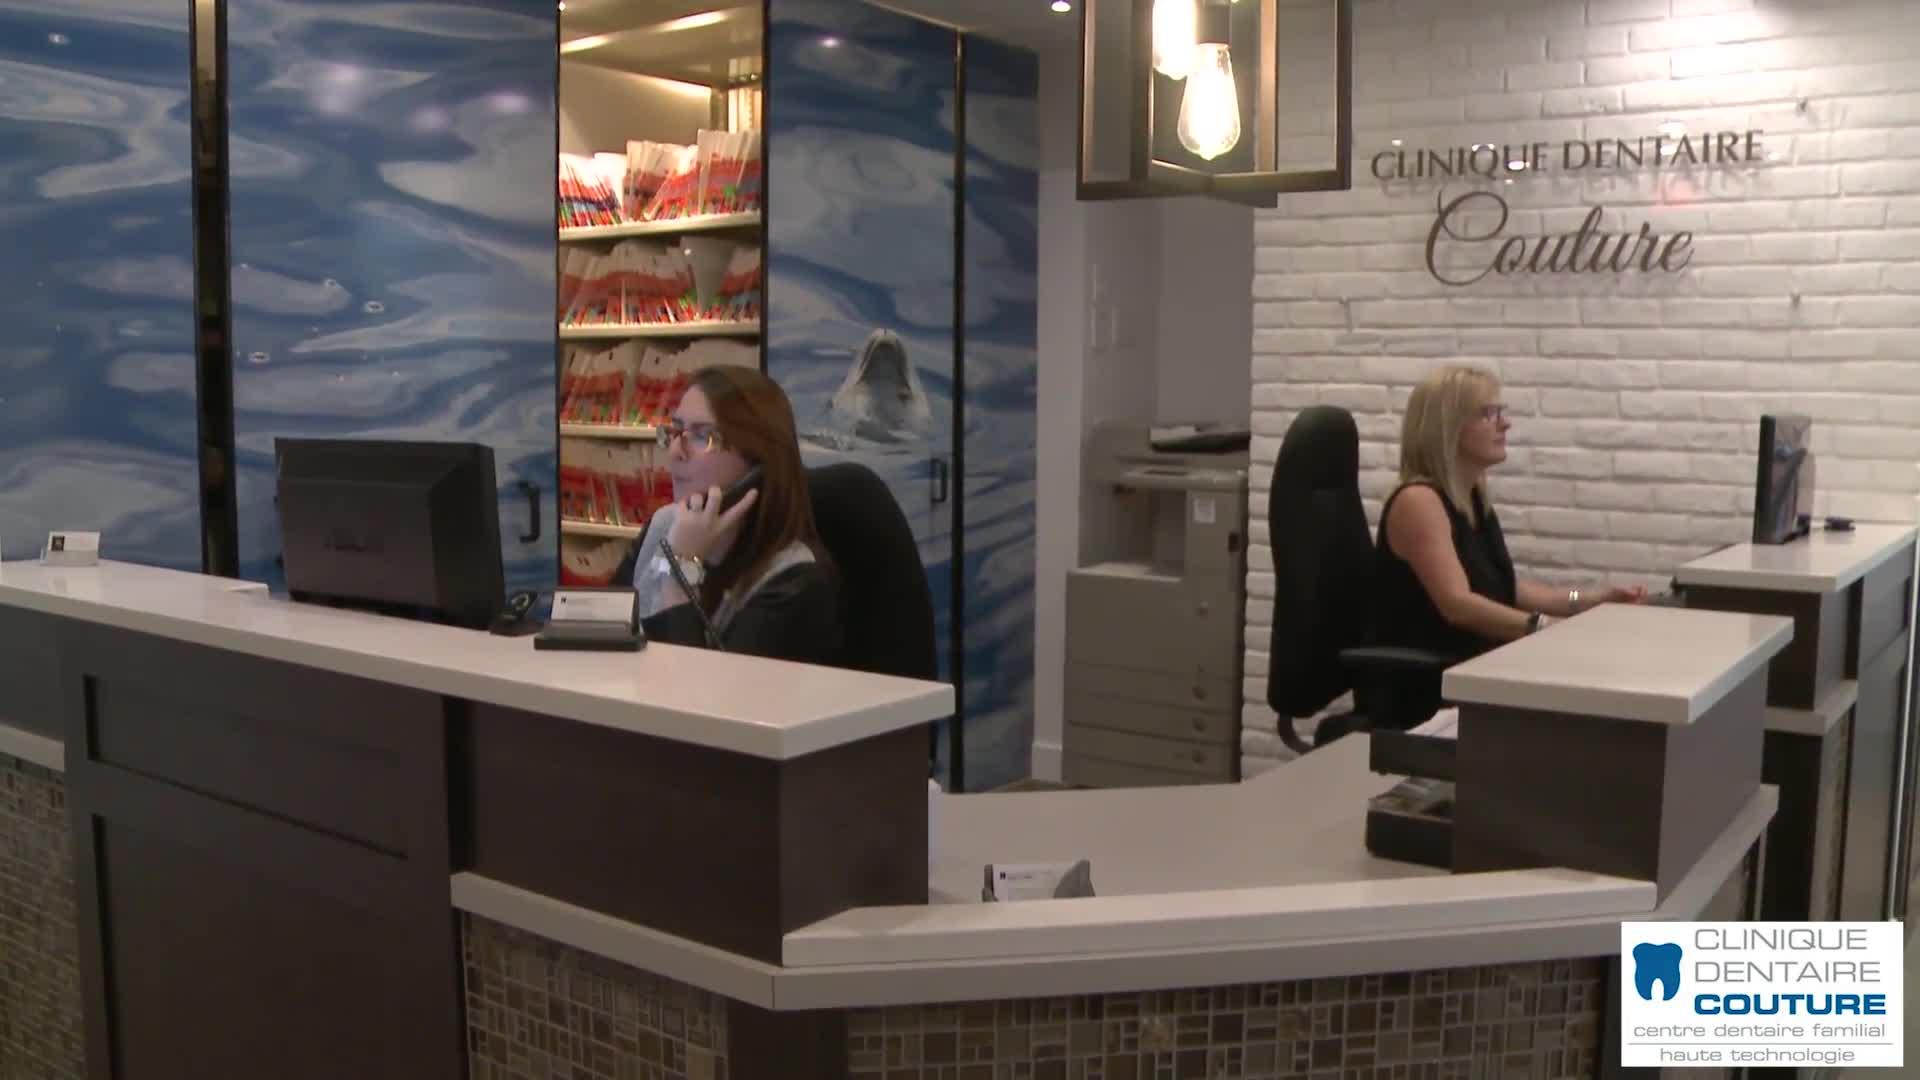 Clinique Dentaire Couture - Dentistes - 4187249192